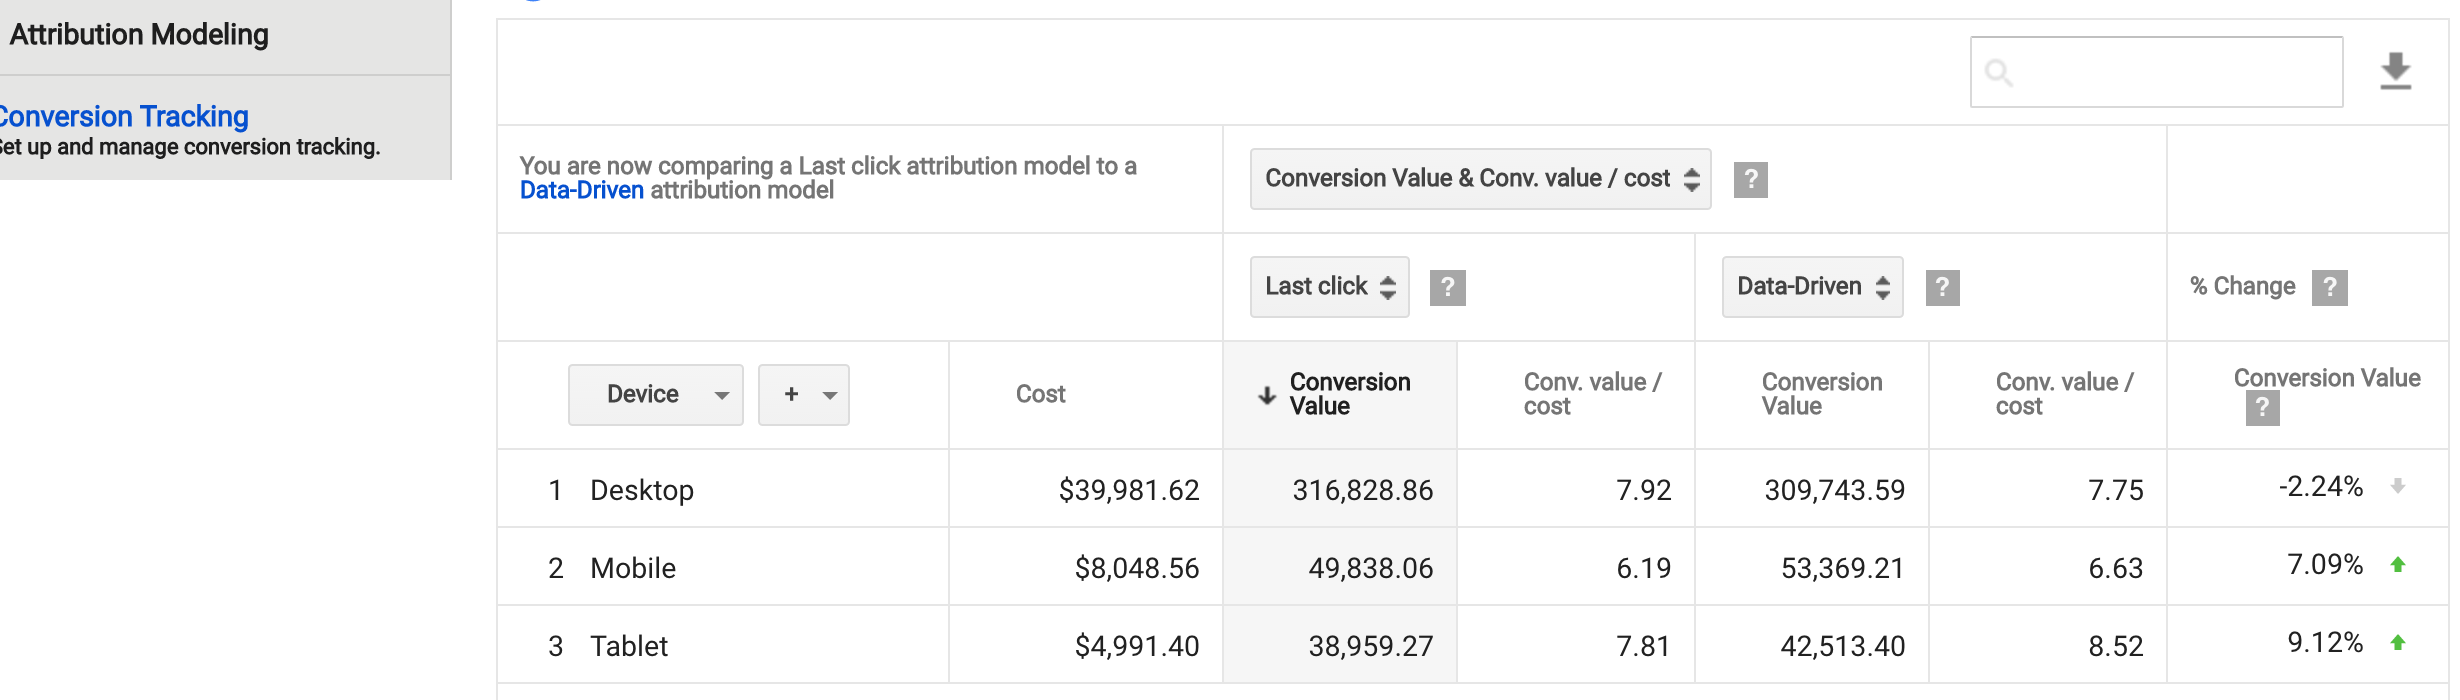 Google's New Attribution Modeling